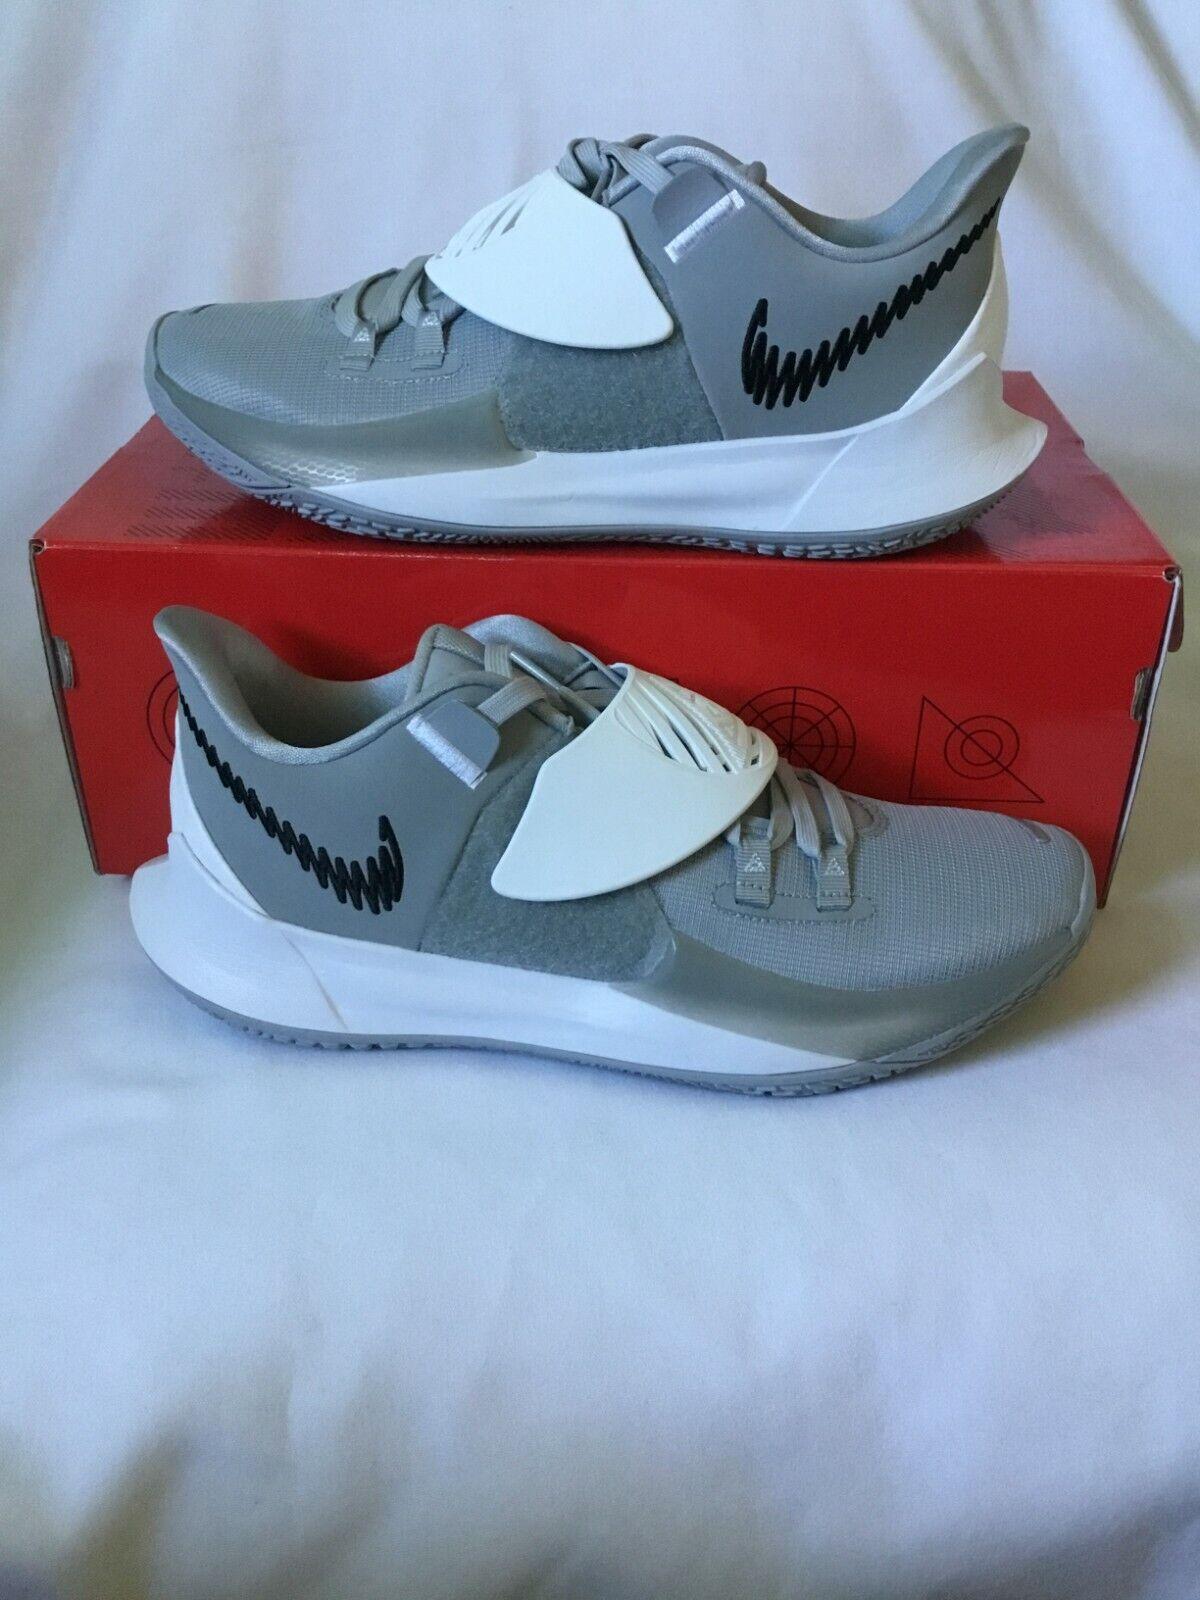 Kyrie Low 3 TB Promo Basketball Shoes SZ - 12 Wolf Grey Black White-CW4147 003